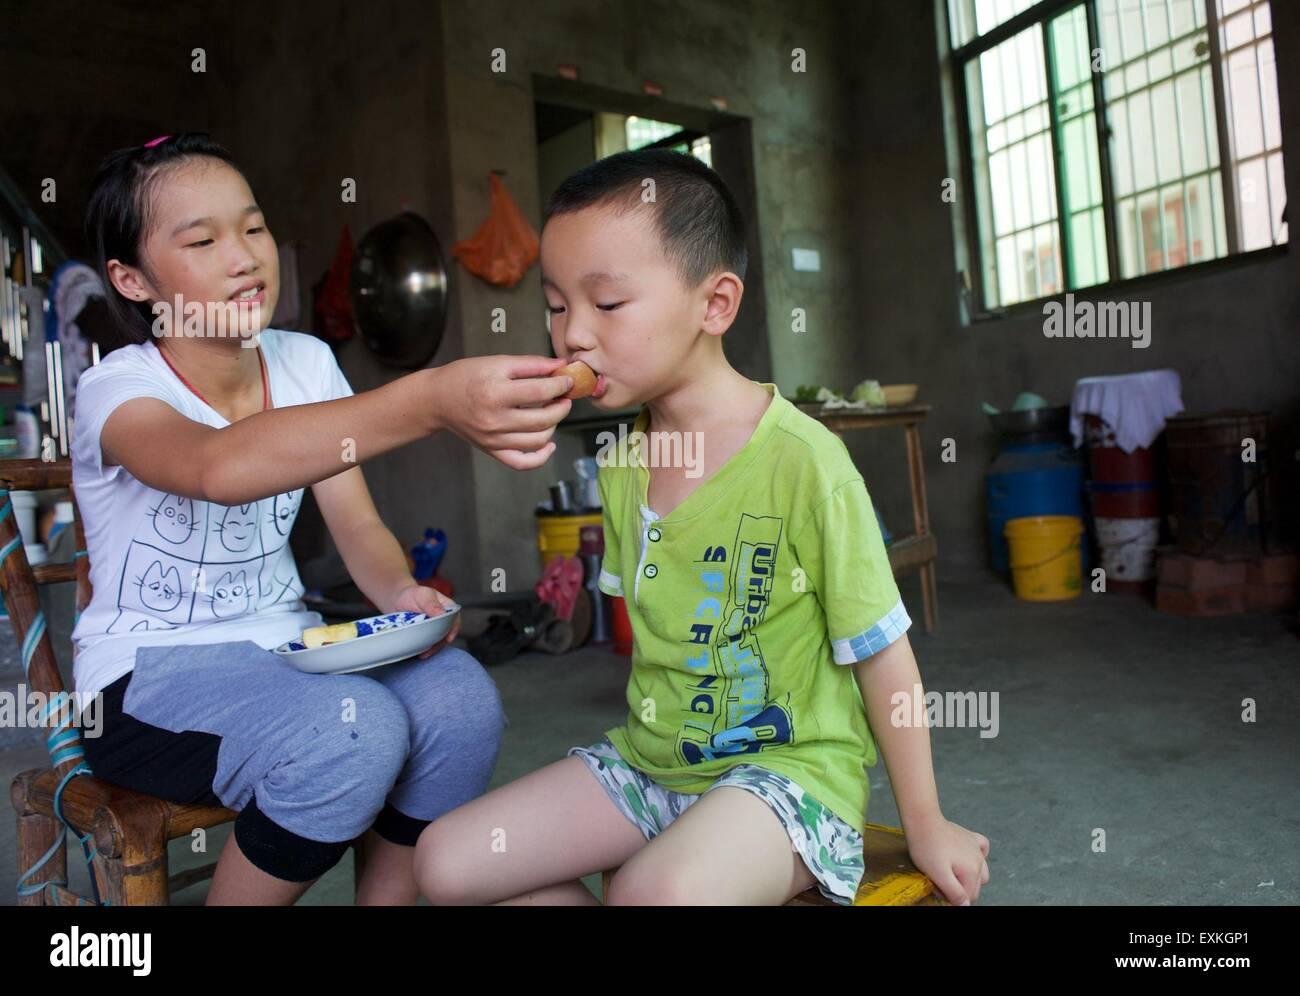 Nanchang, Nanchang City of east China's Jiangxi Province. 14th July, 2015. Li Wenyu (L) feeds her brother with - Stock Image